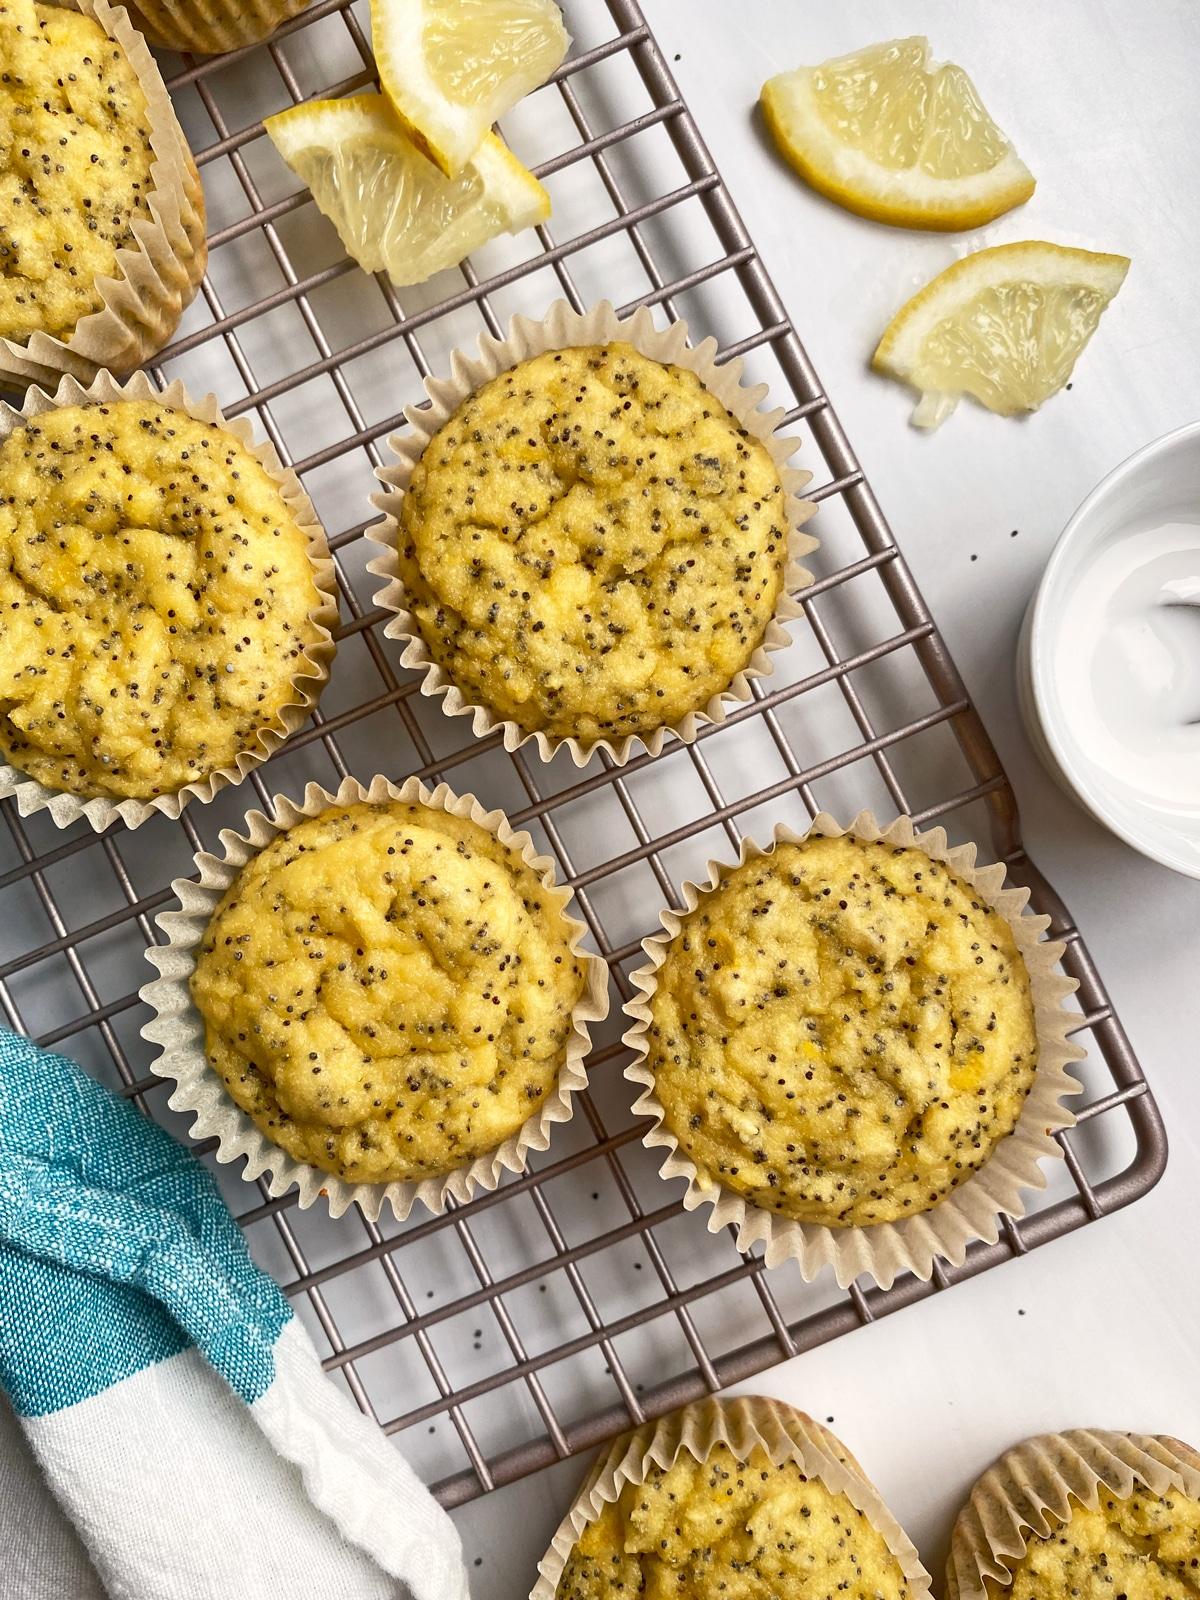 lemon poppy seed muffins on cooling rack